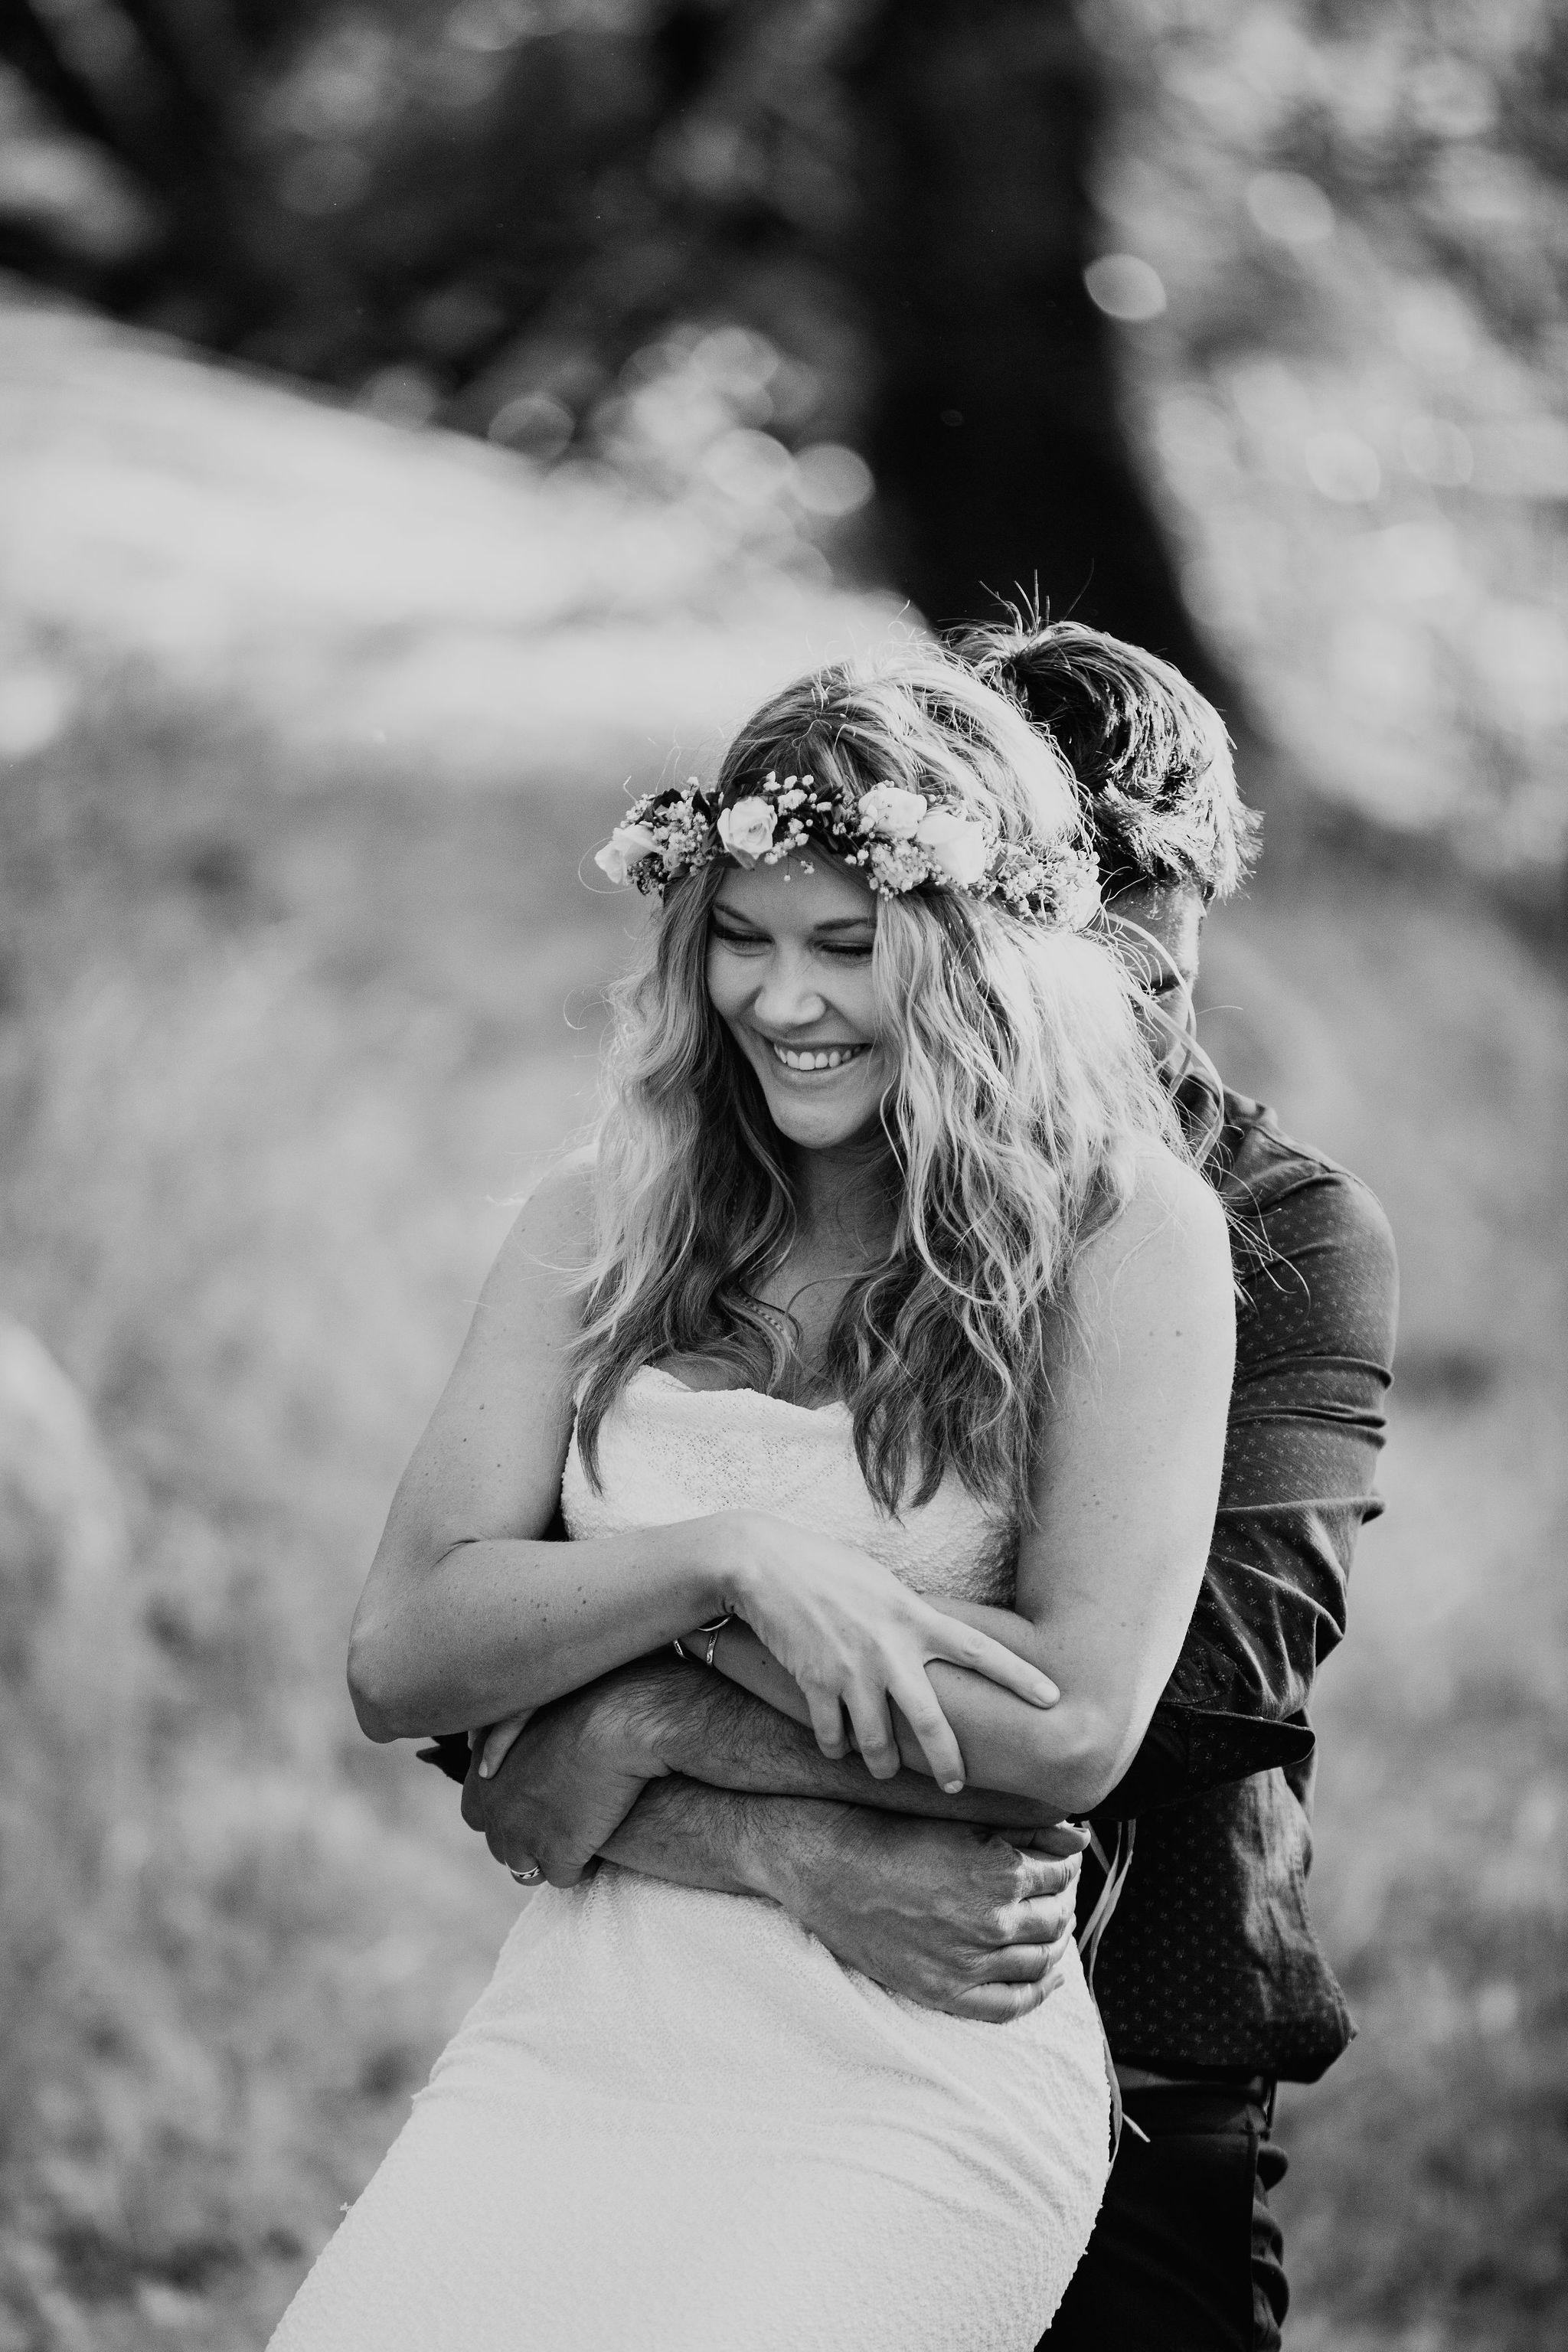 RedwoodRanch_Geoff&LyndsiPhotography_Mike&Amanda_Romantics26.jpg